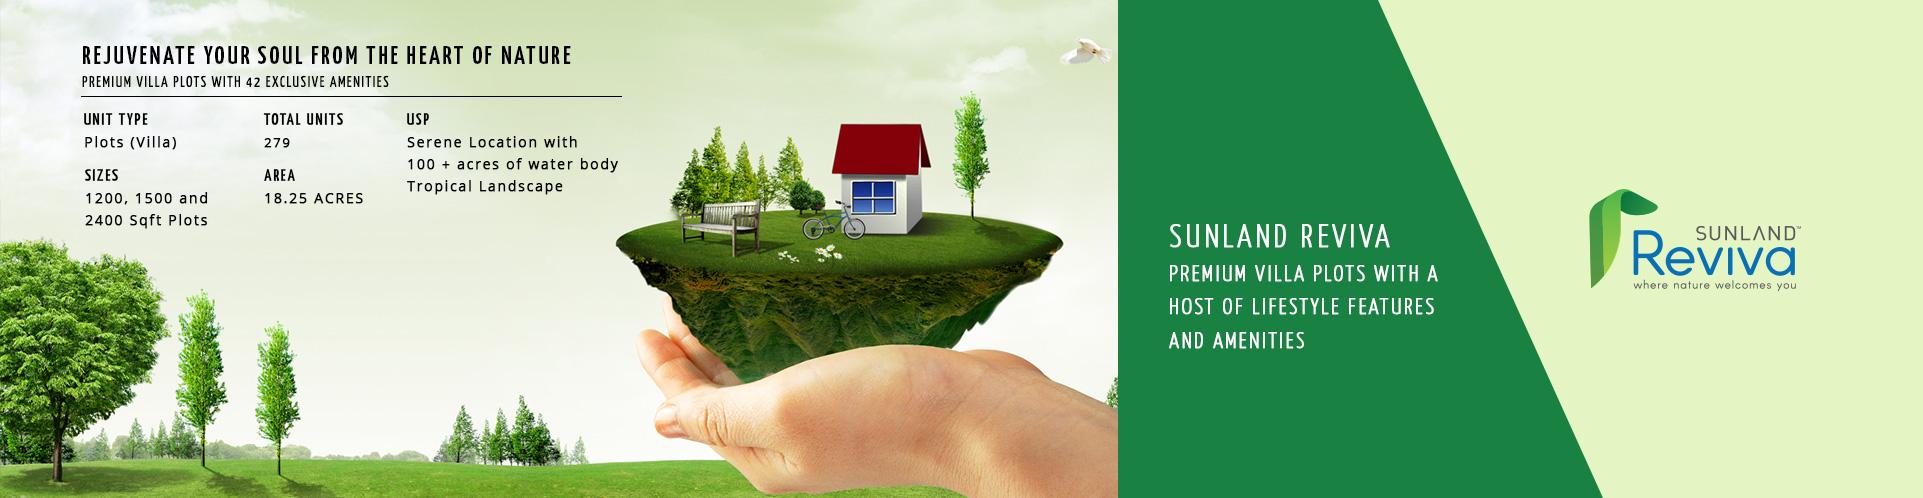 Sunland Ventures_Sunland Reviva